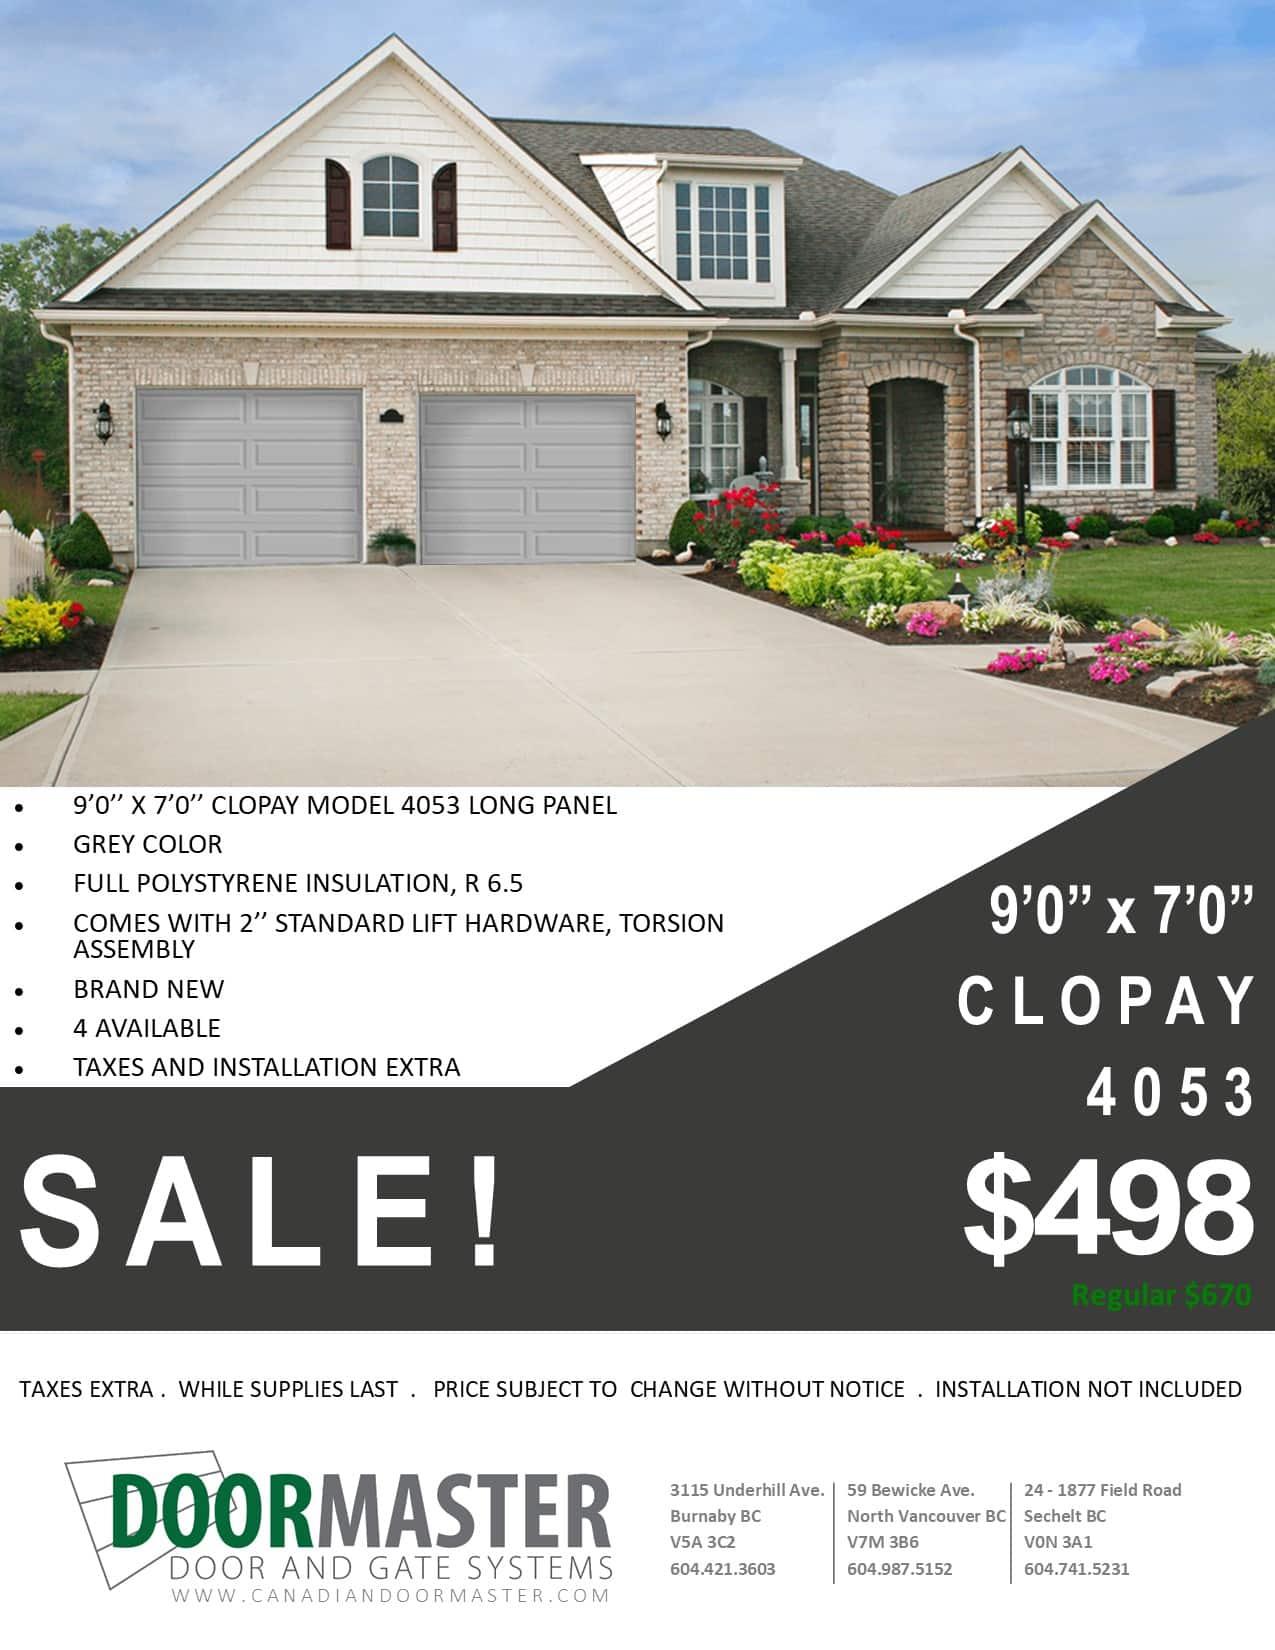 Clopay 9′ x 7′ model 4053 long panel